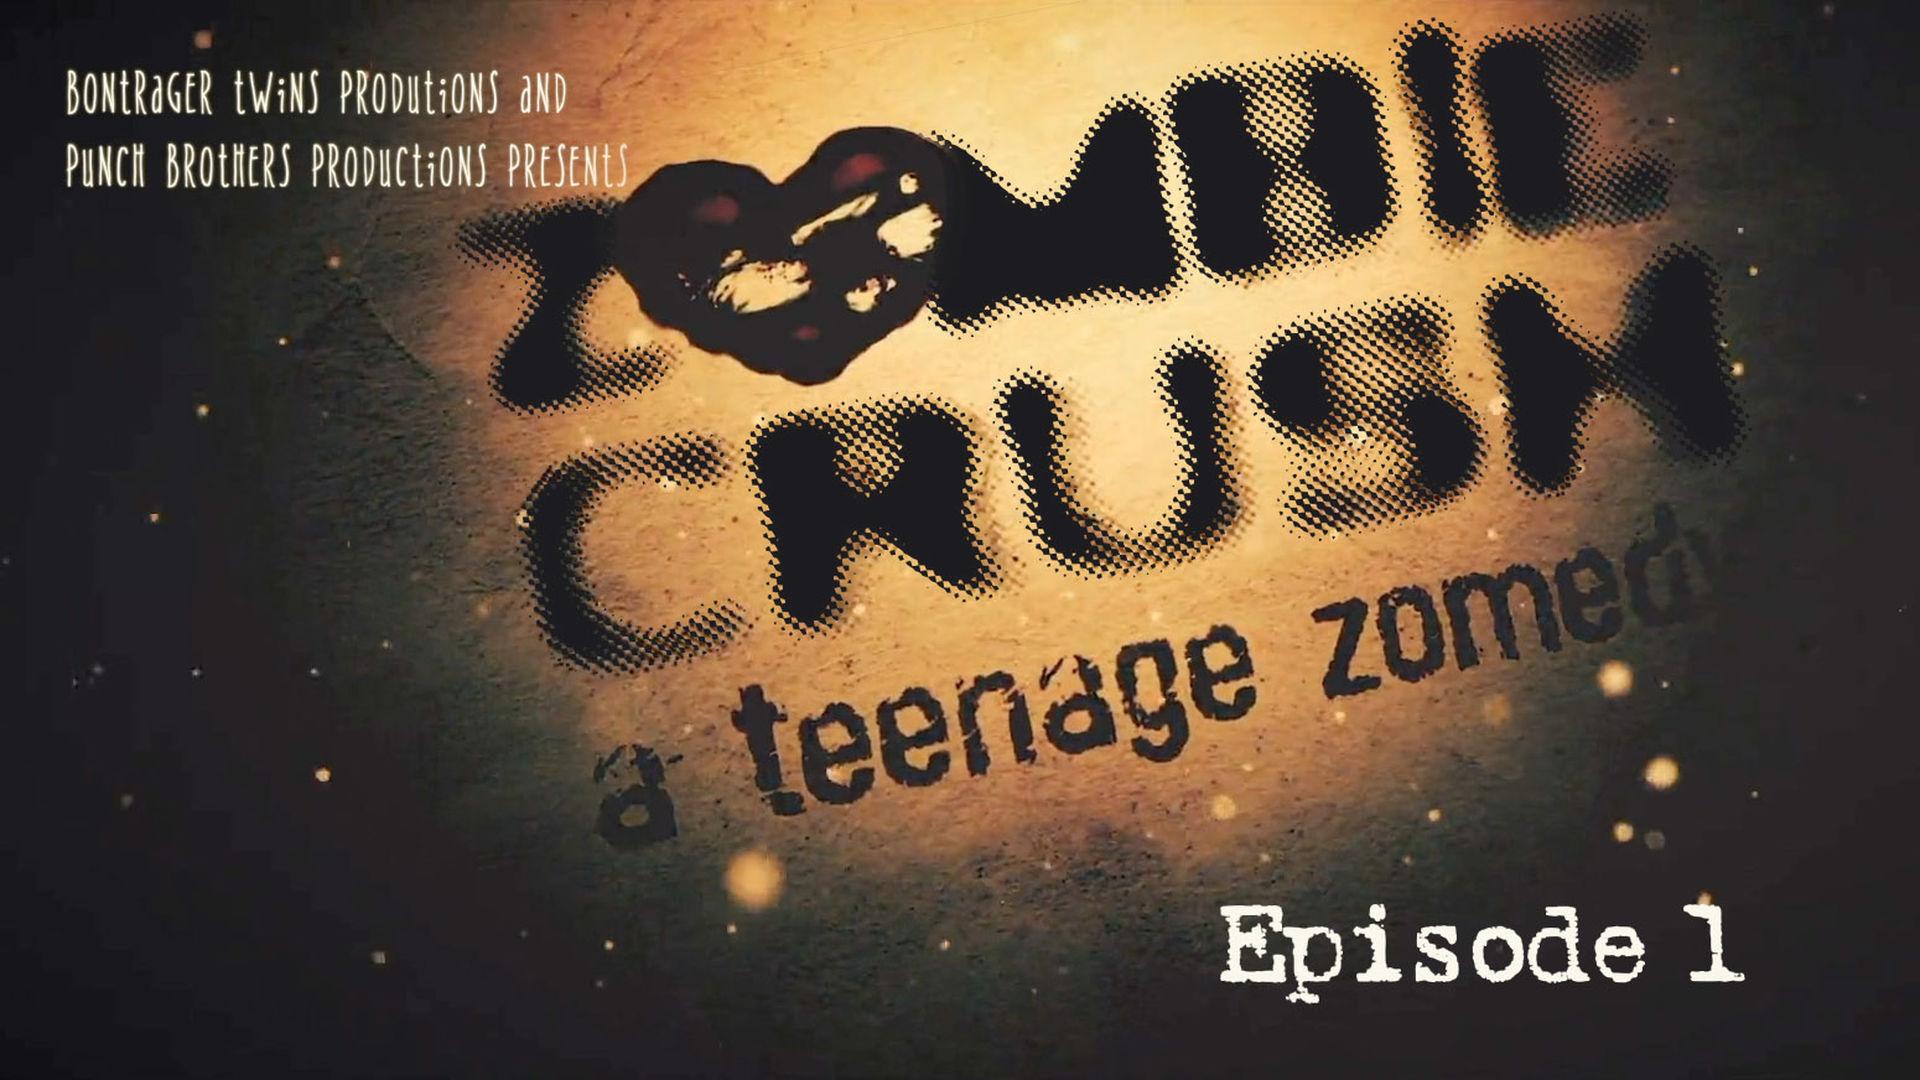 Zombie Crush - Ep1 - A Teenage Zomedy